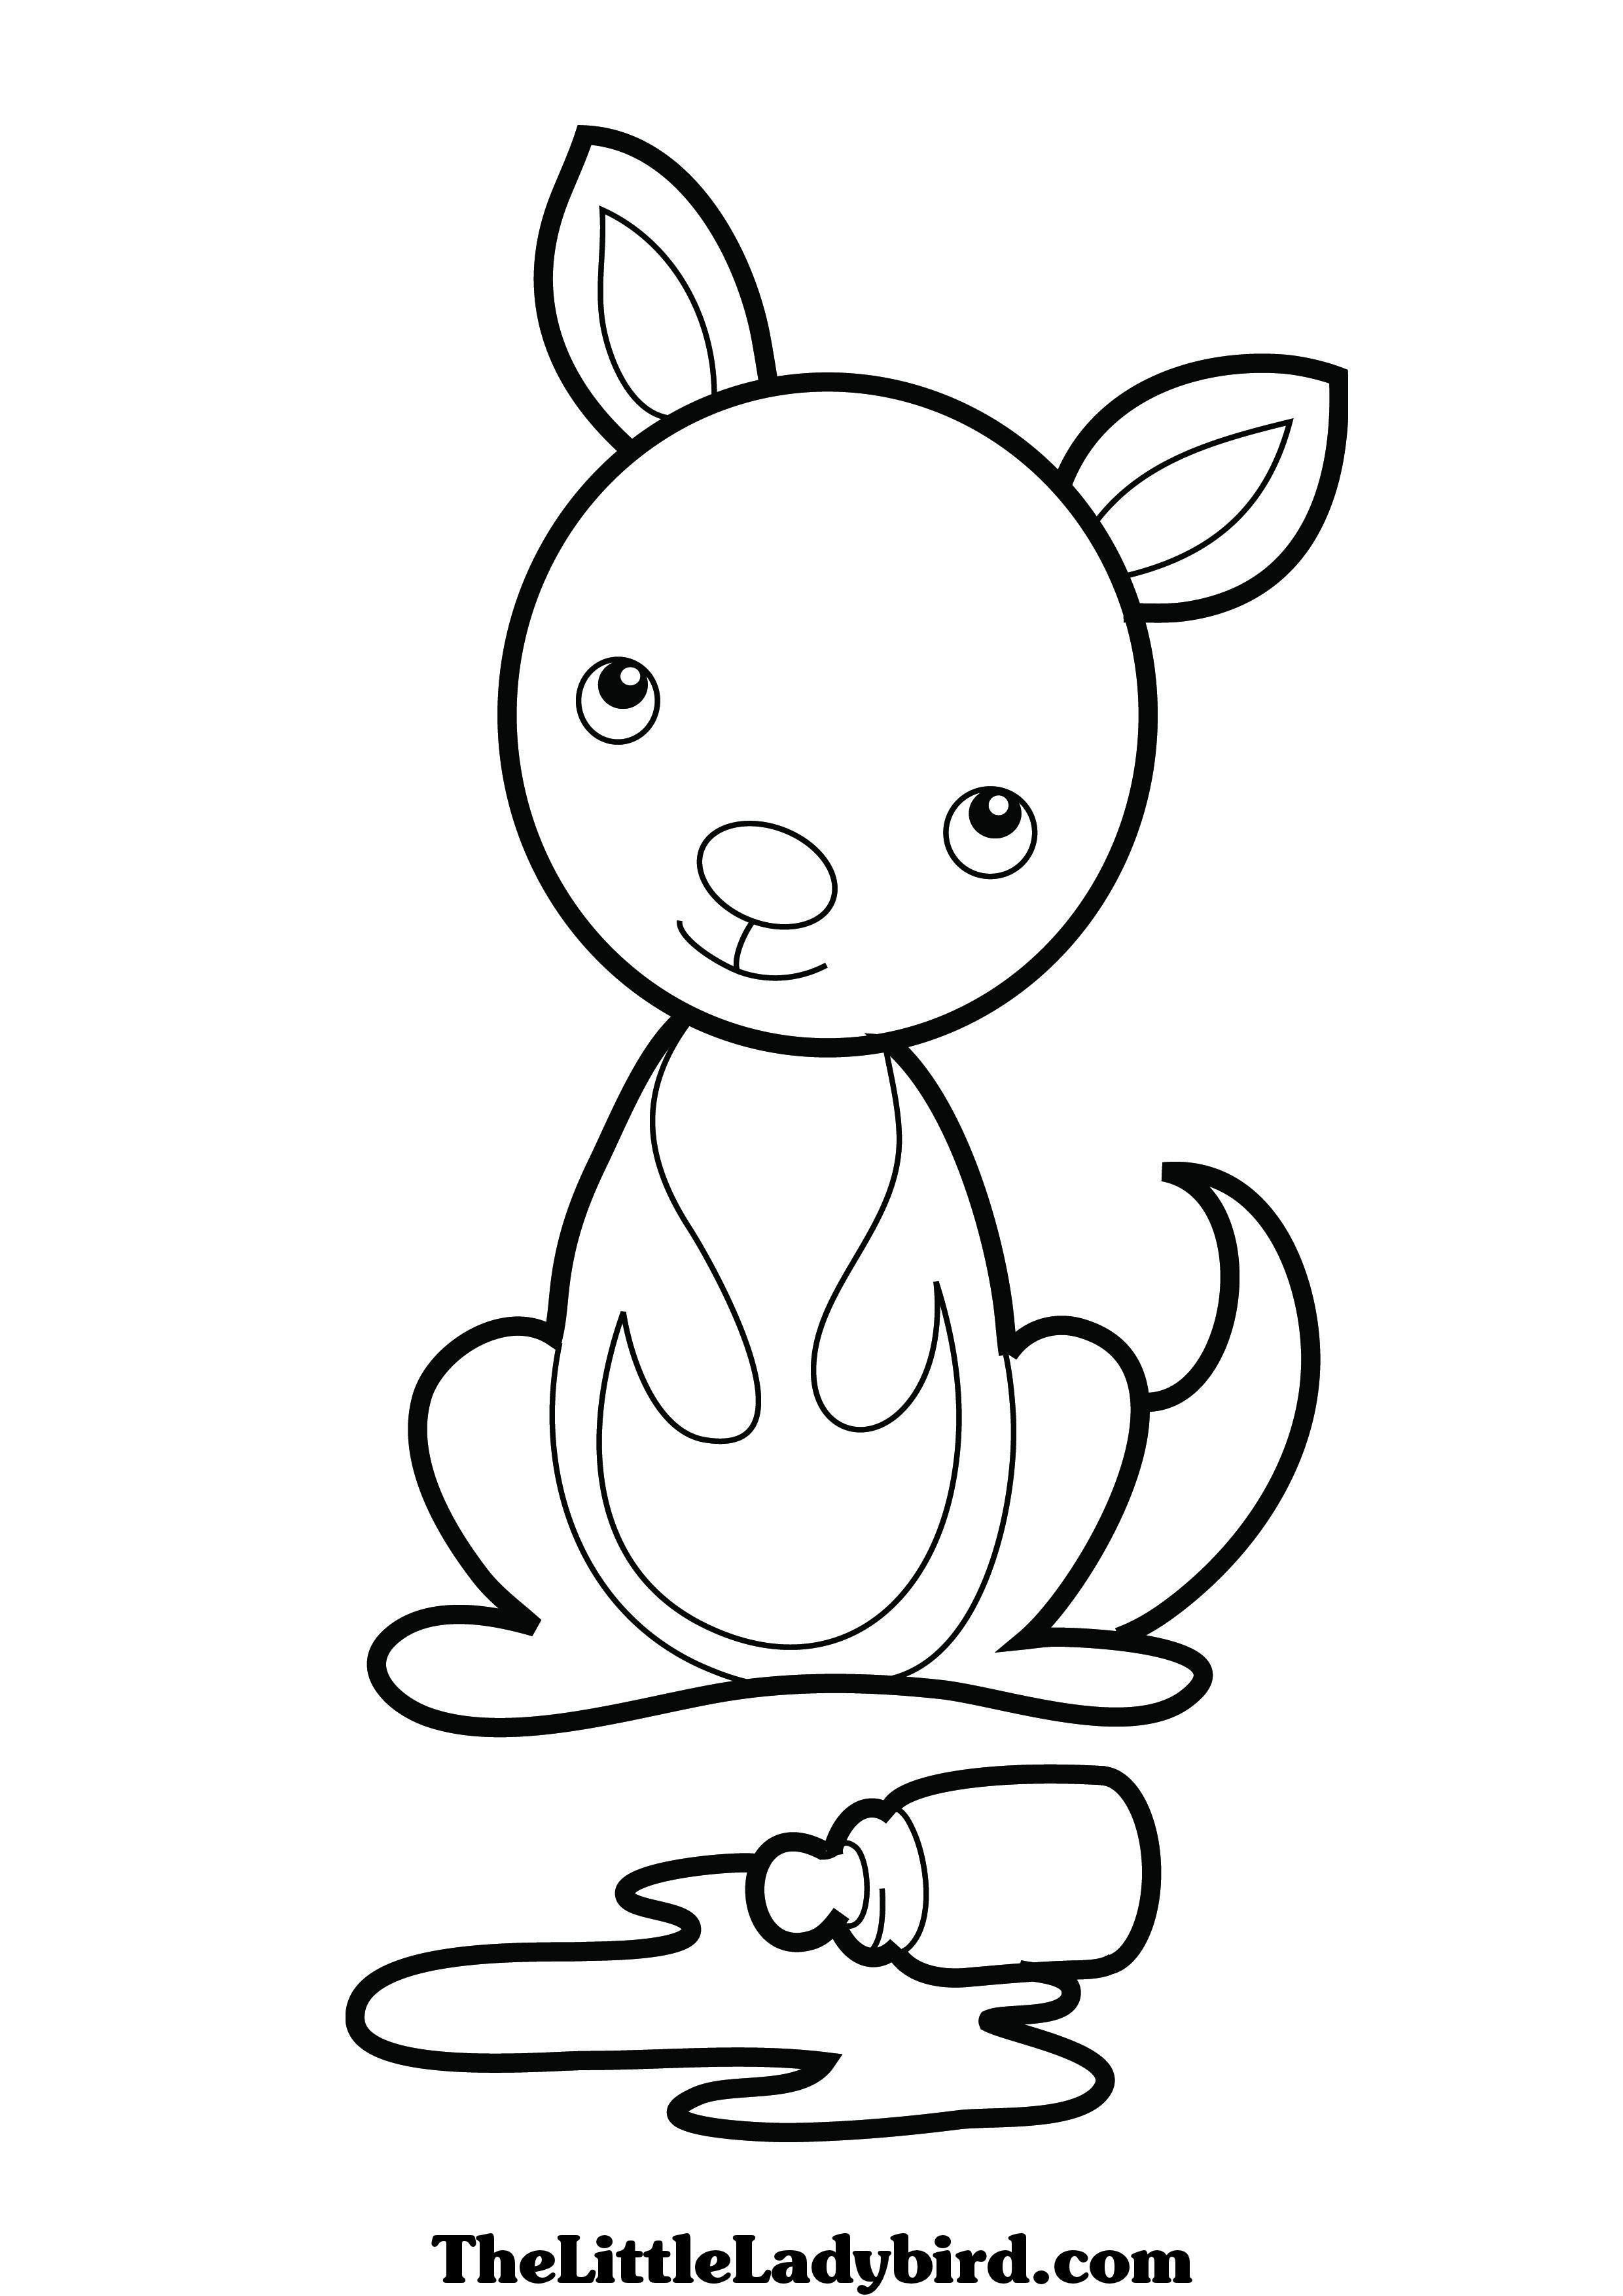 Kangaroo Coloring Page Jpg 2 480 3 508 Pixels Coloring Pages Animal Coloring Pages Kangaroo Craft